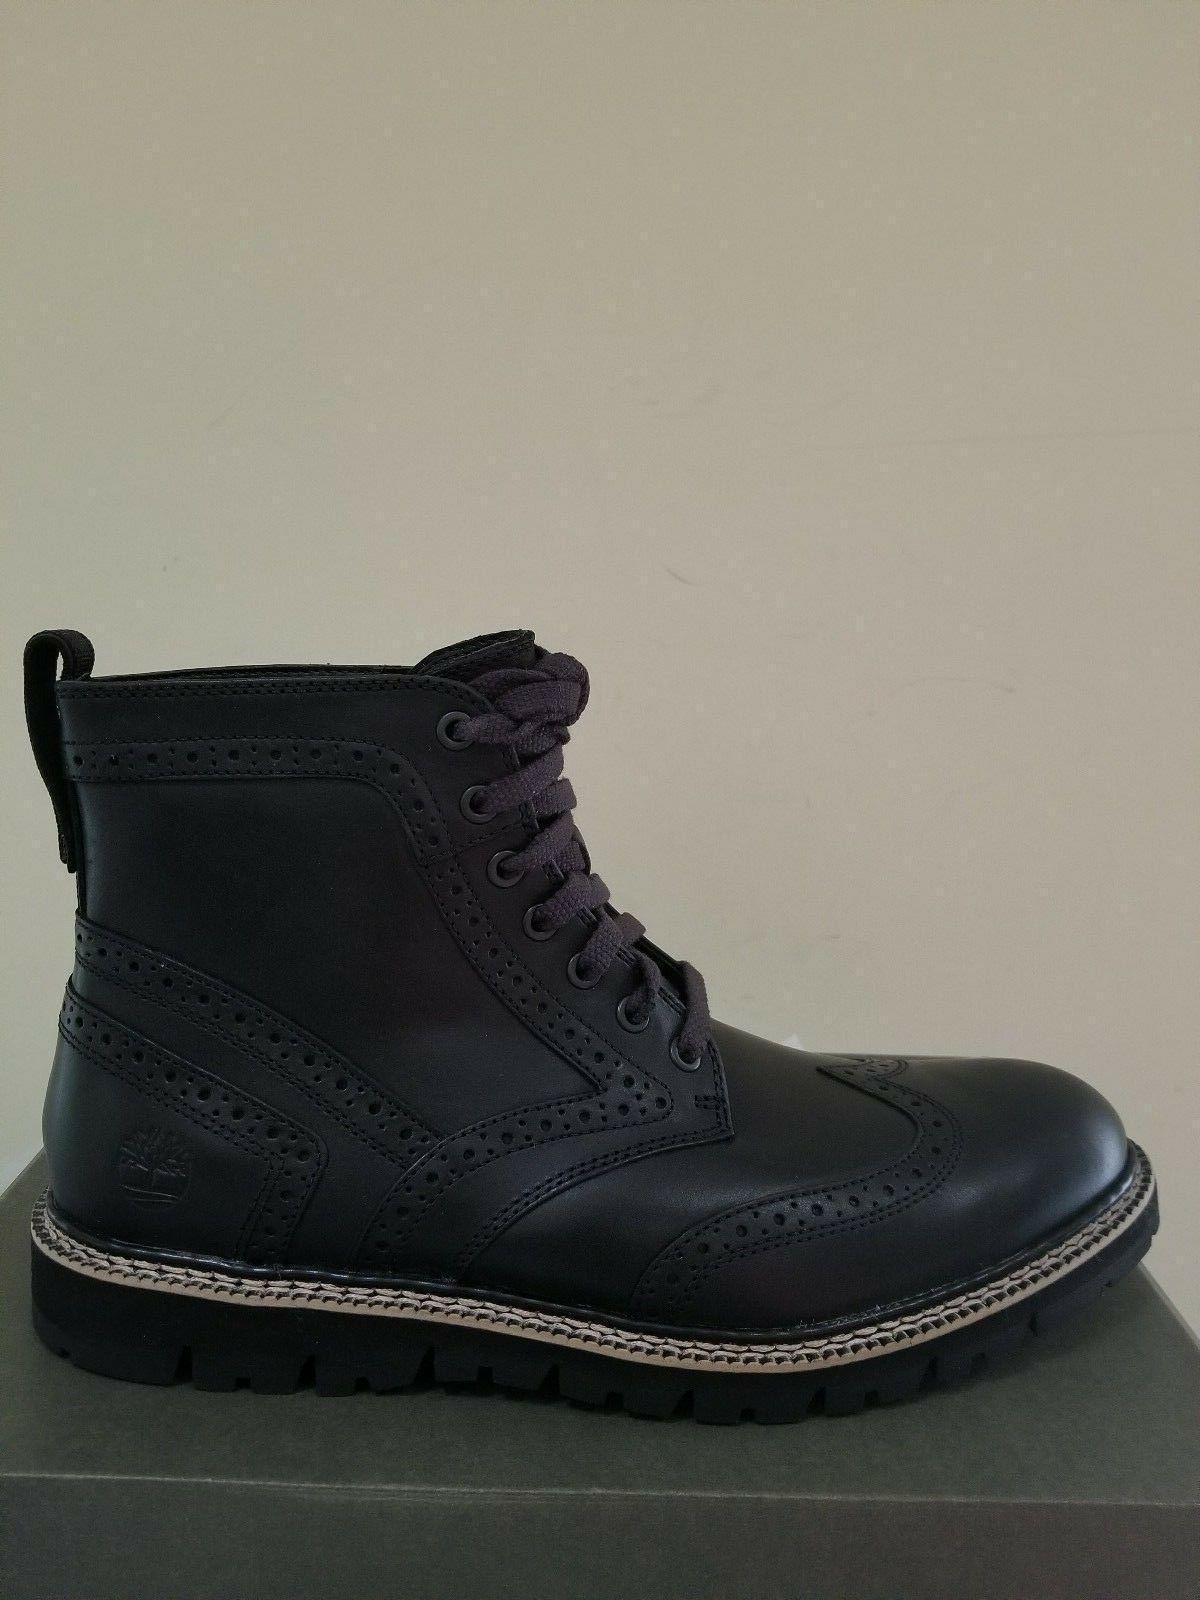 Timberland Men's Britton Hill Wingtip Waterproof Boots Black